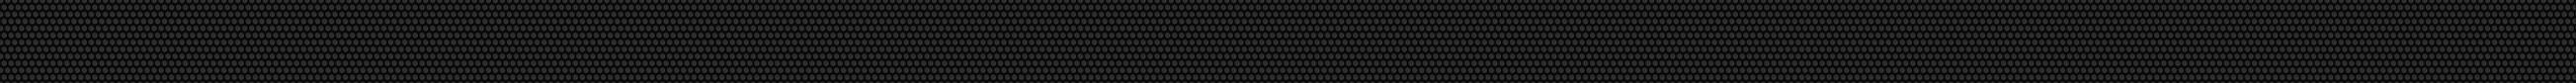 texture-1306790 modulo franja 01.jpg